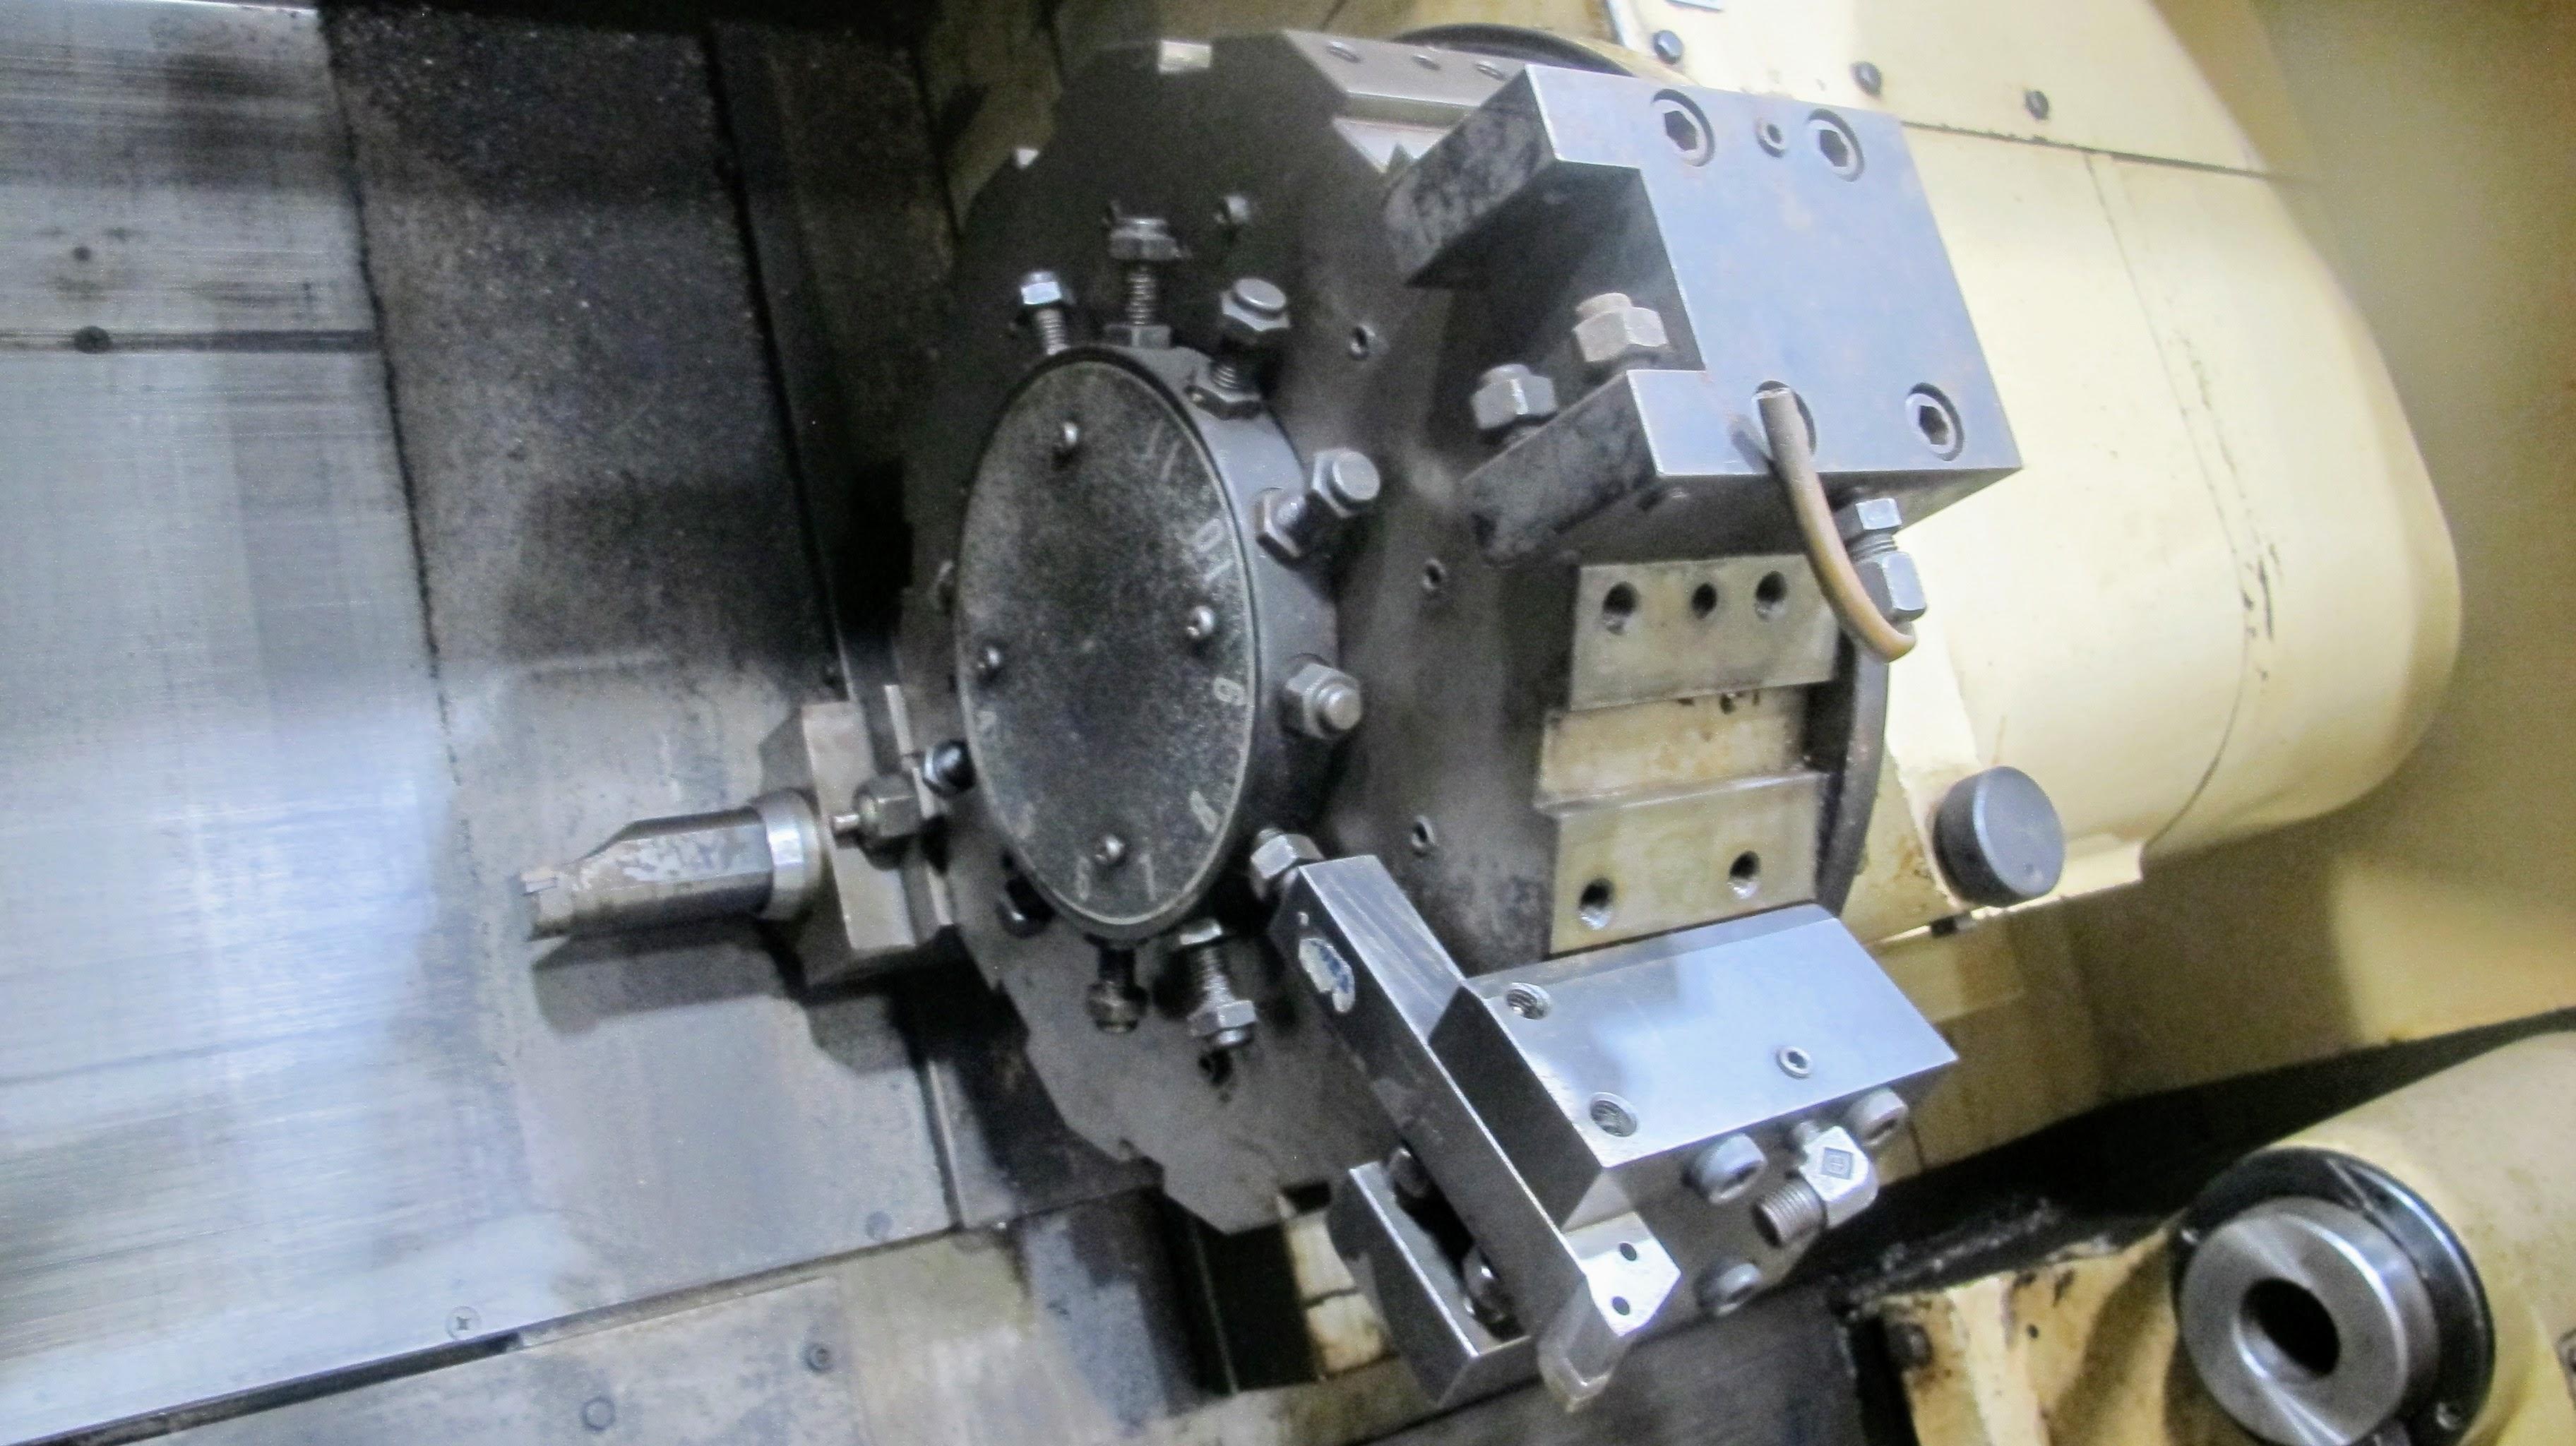 "OKUMA ACT-4 CNC LATHE W/12"" 3 JAW CHUCK, FANUC CONTROL, TAIL STOCK, ATC-12 W/10 TOOL HOLDERS, - Image 5 of 17"